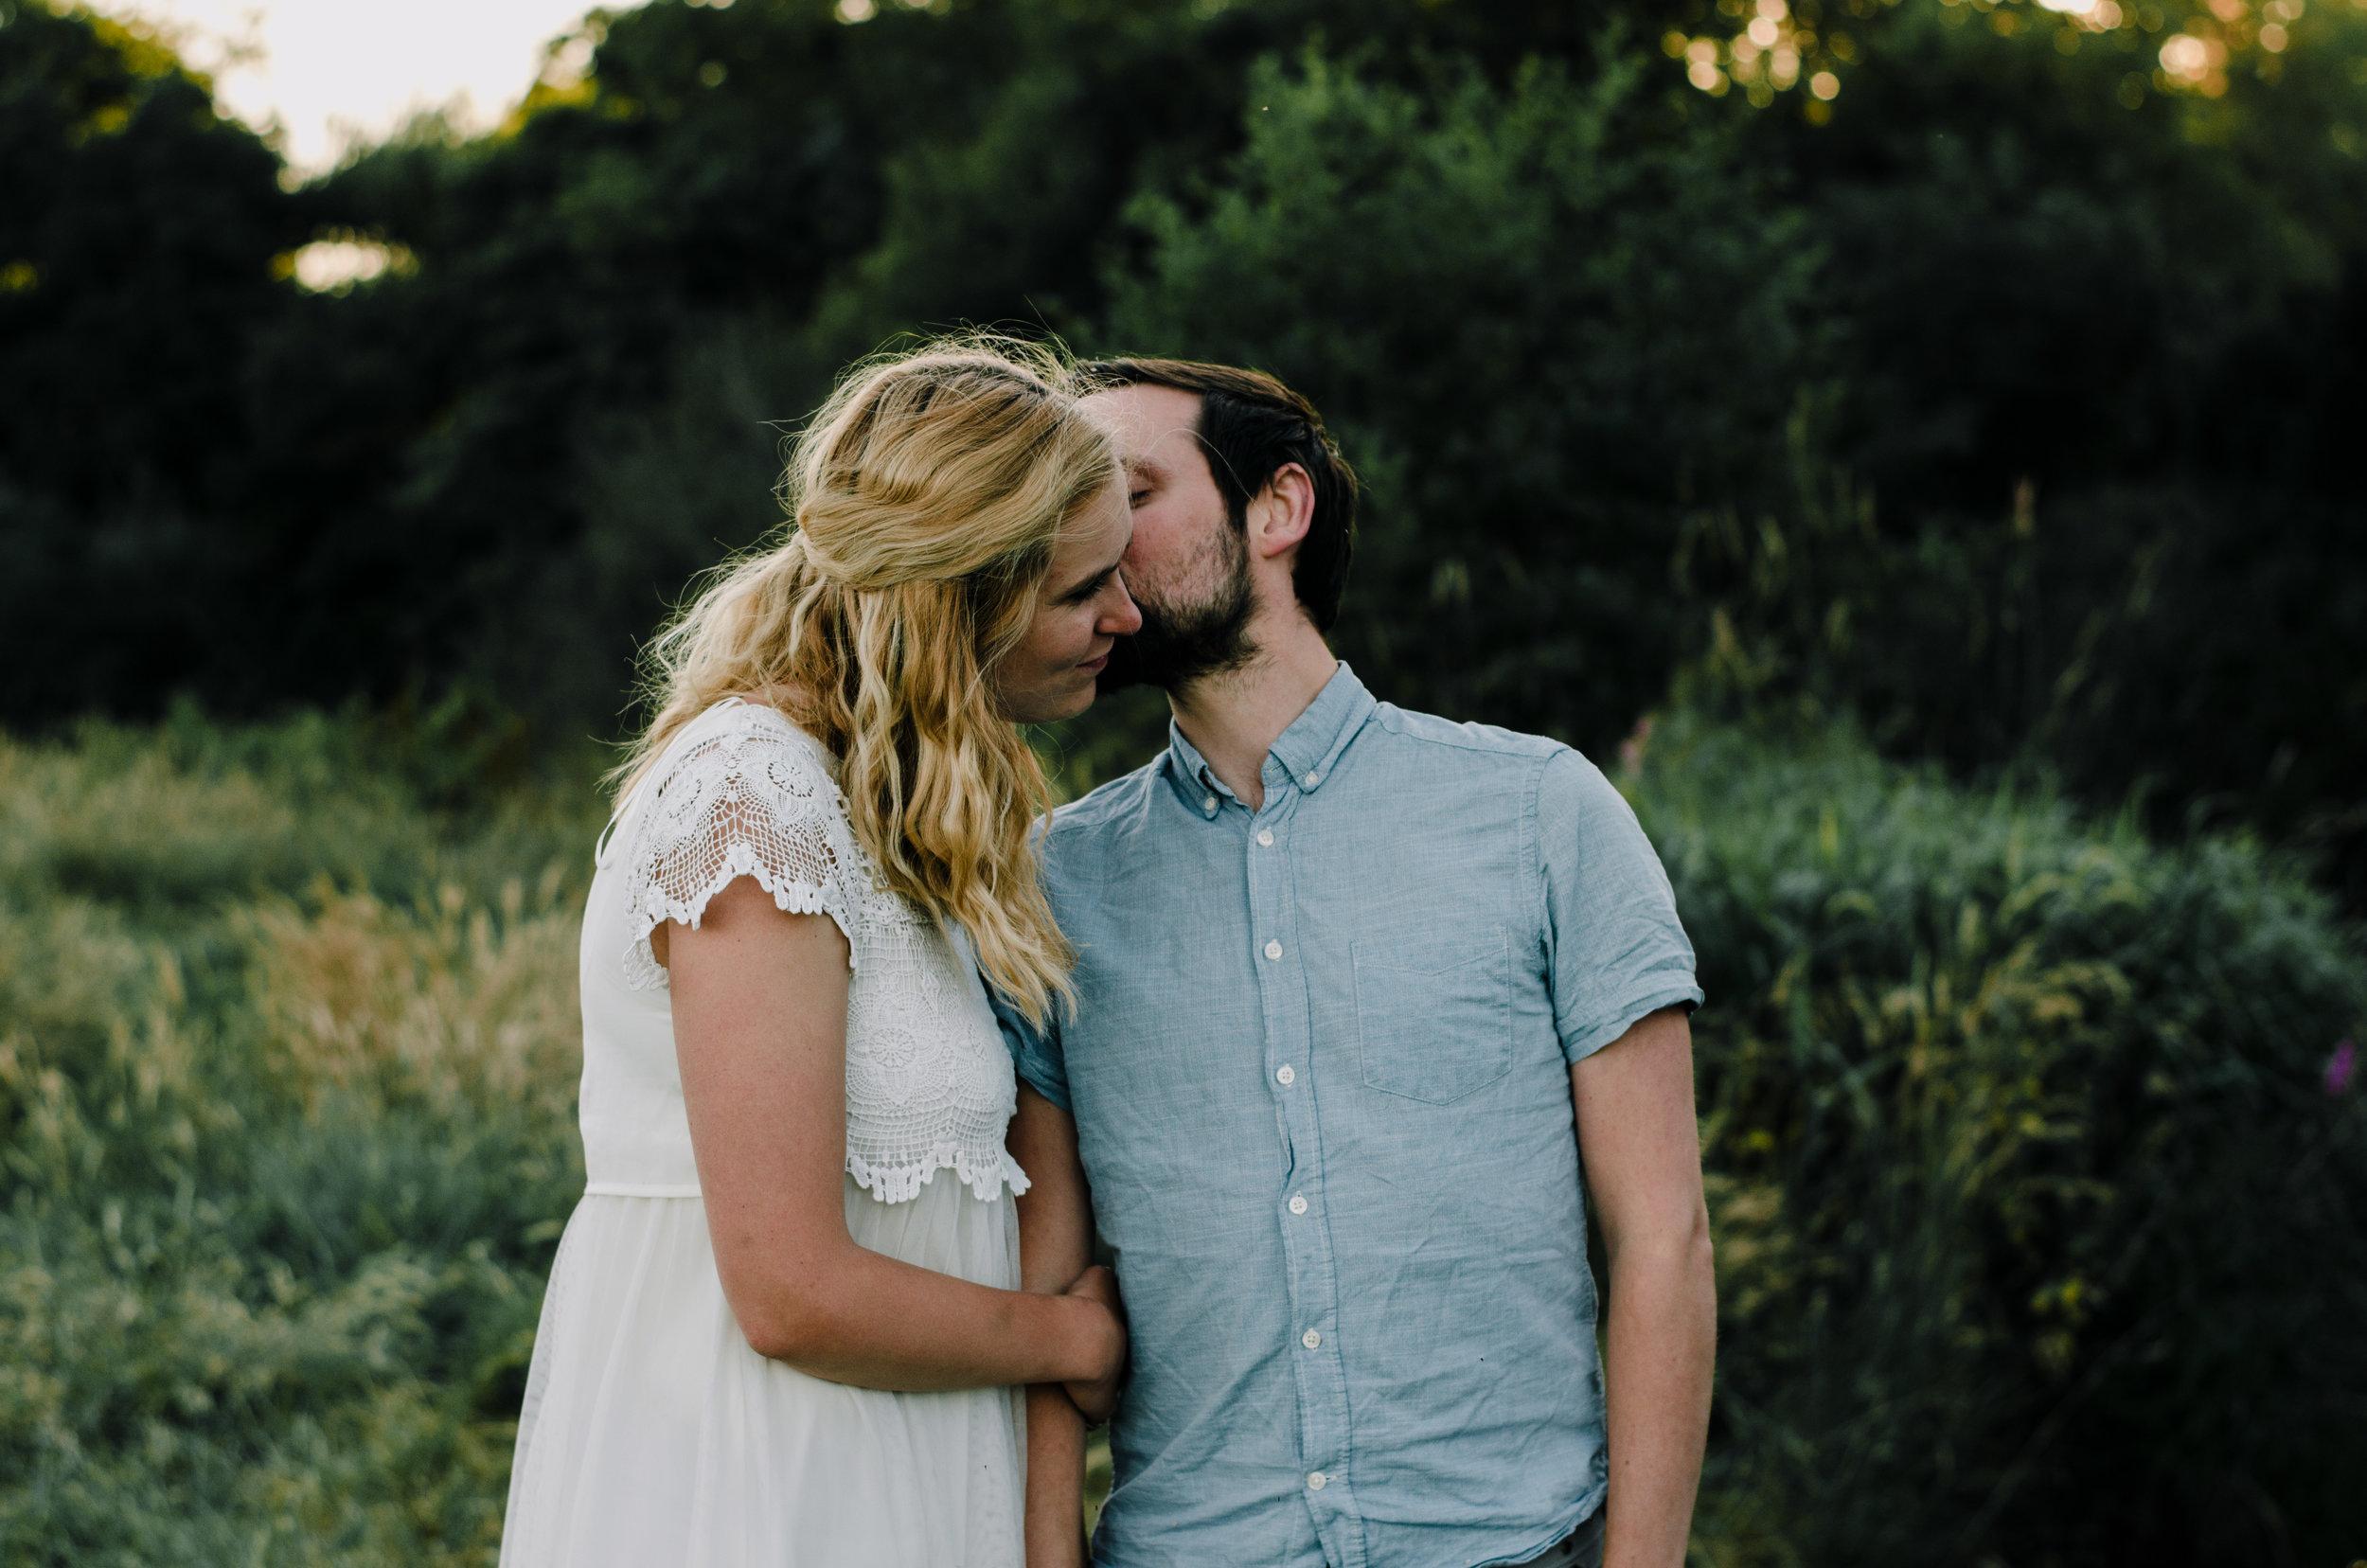 Gina & Chris - Barcombe Mills - Couple Session - Aiste Saulyte Photography-51.jpg